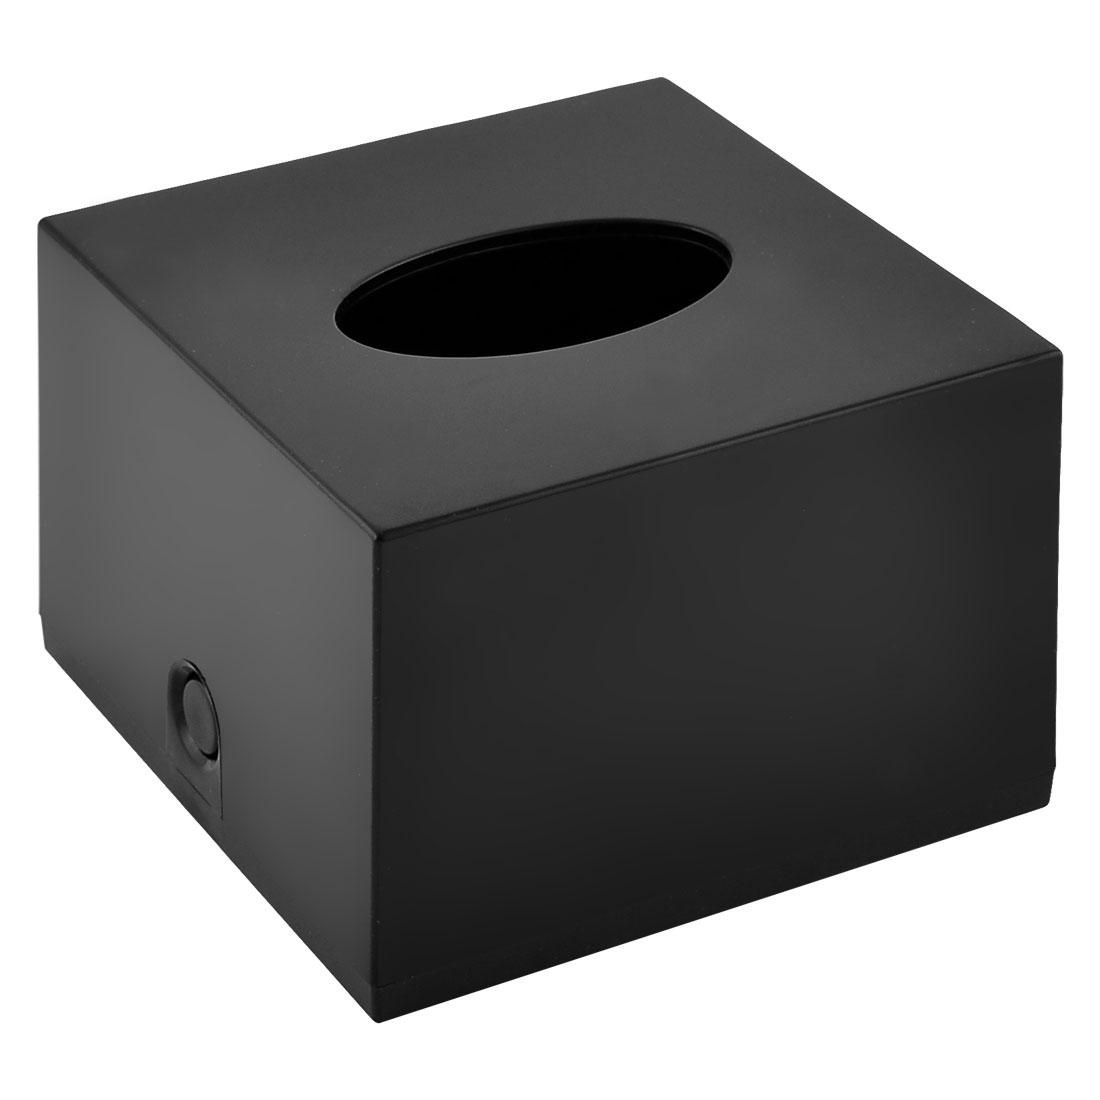 Home Hotel Bathroom Plastic Square Tissue Paper Storage Box Holder Case Black